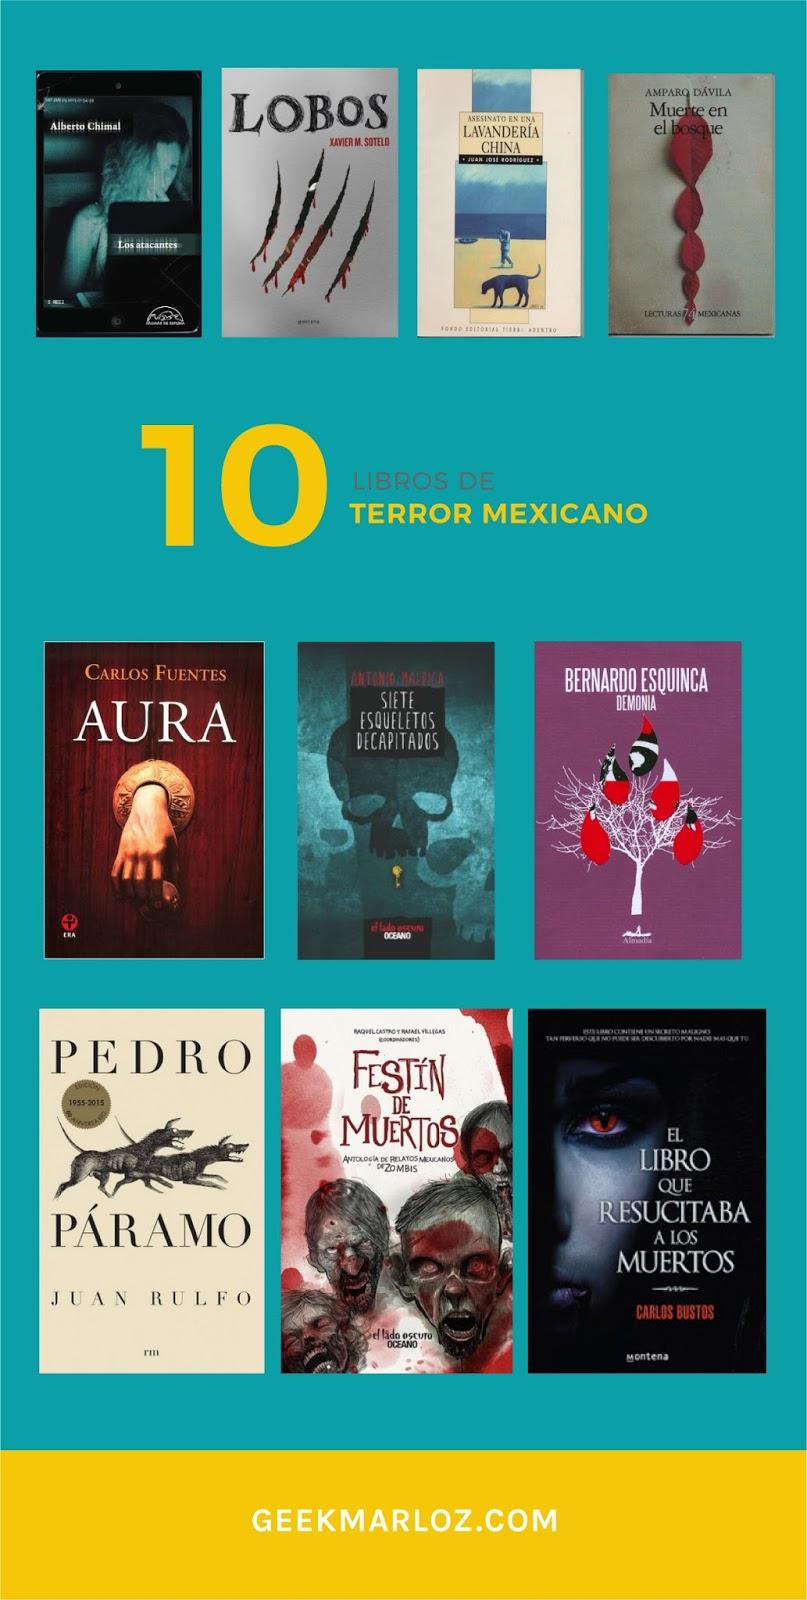 10 libros de terror mexicano que no te debes perder